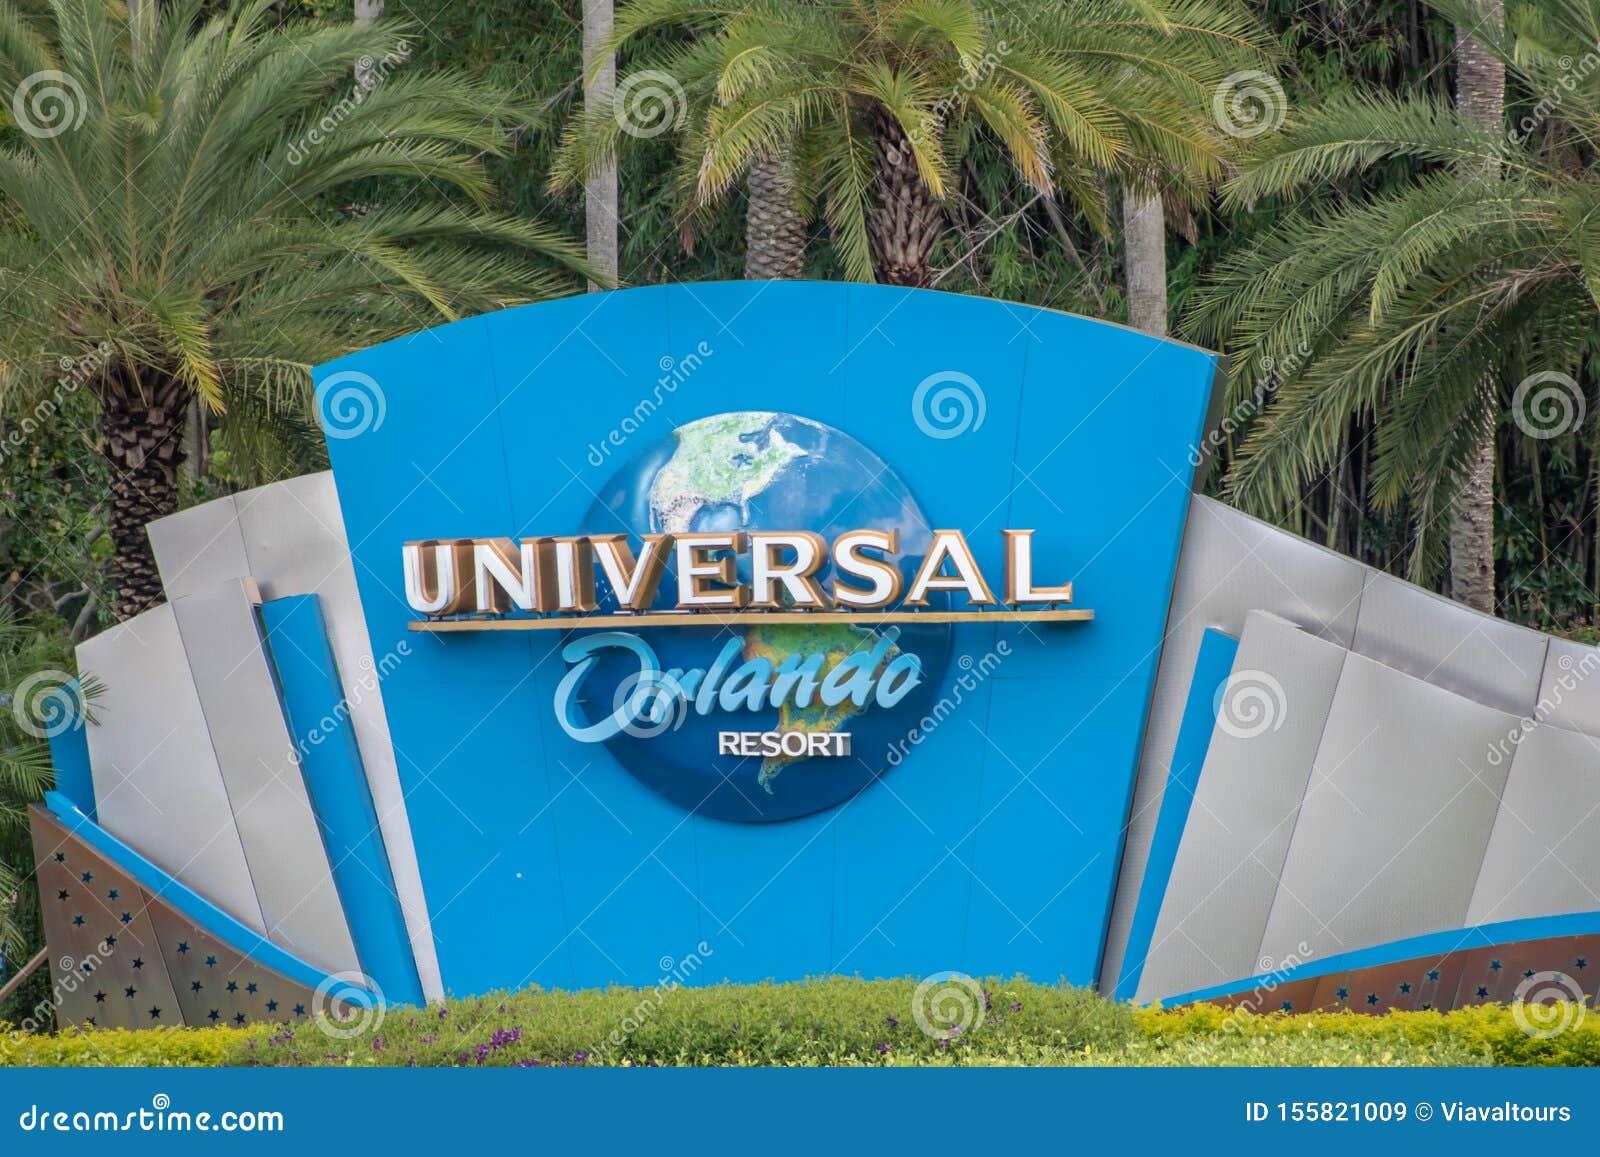 Universal Orlando logo at Universal Studios area 3.